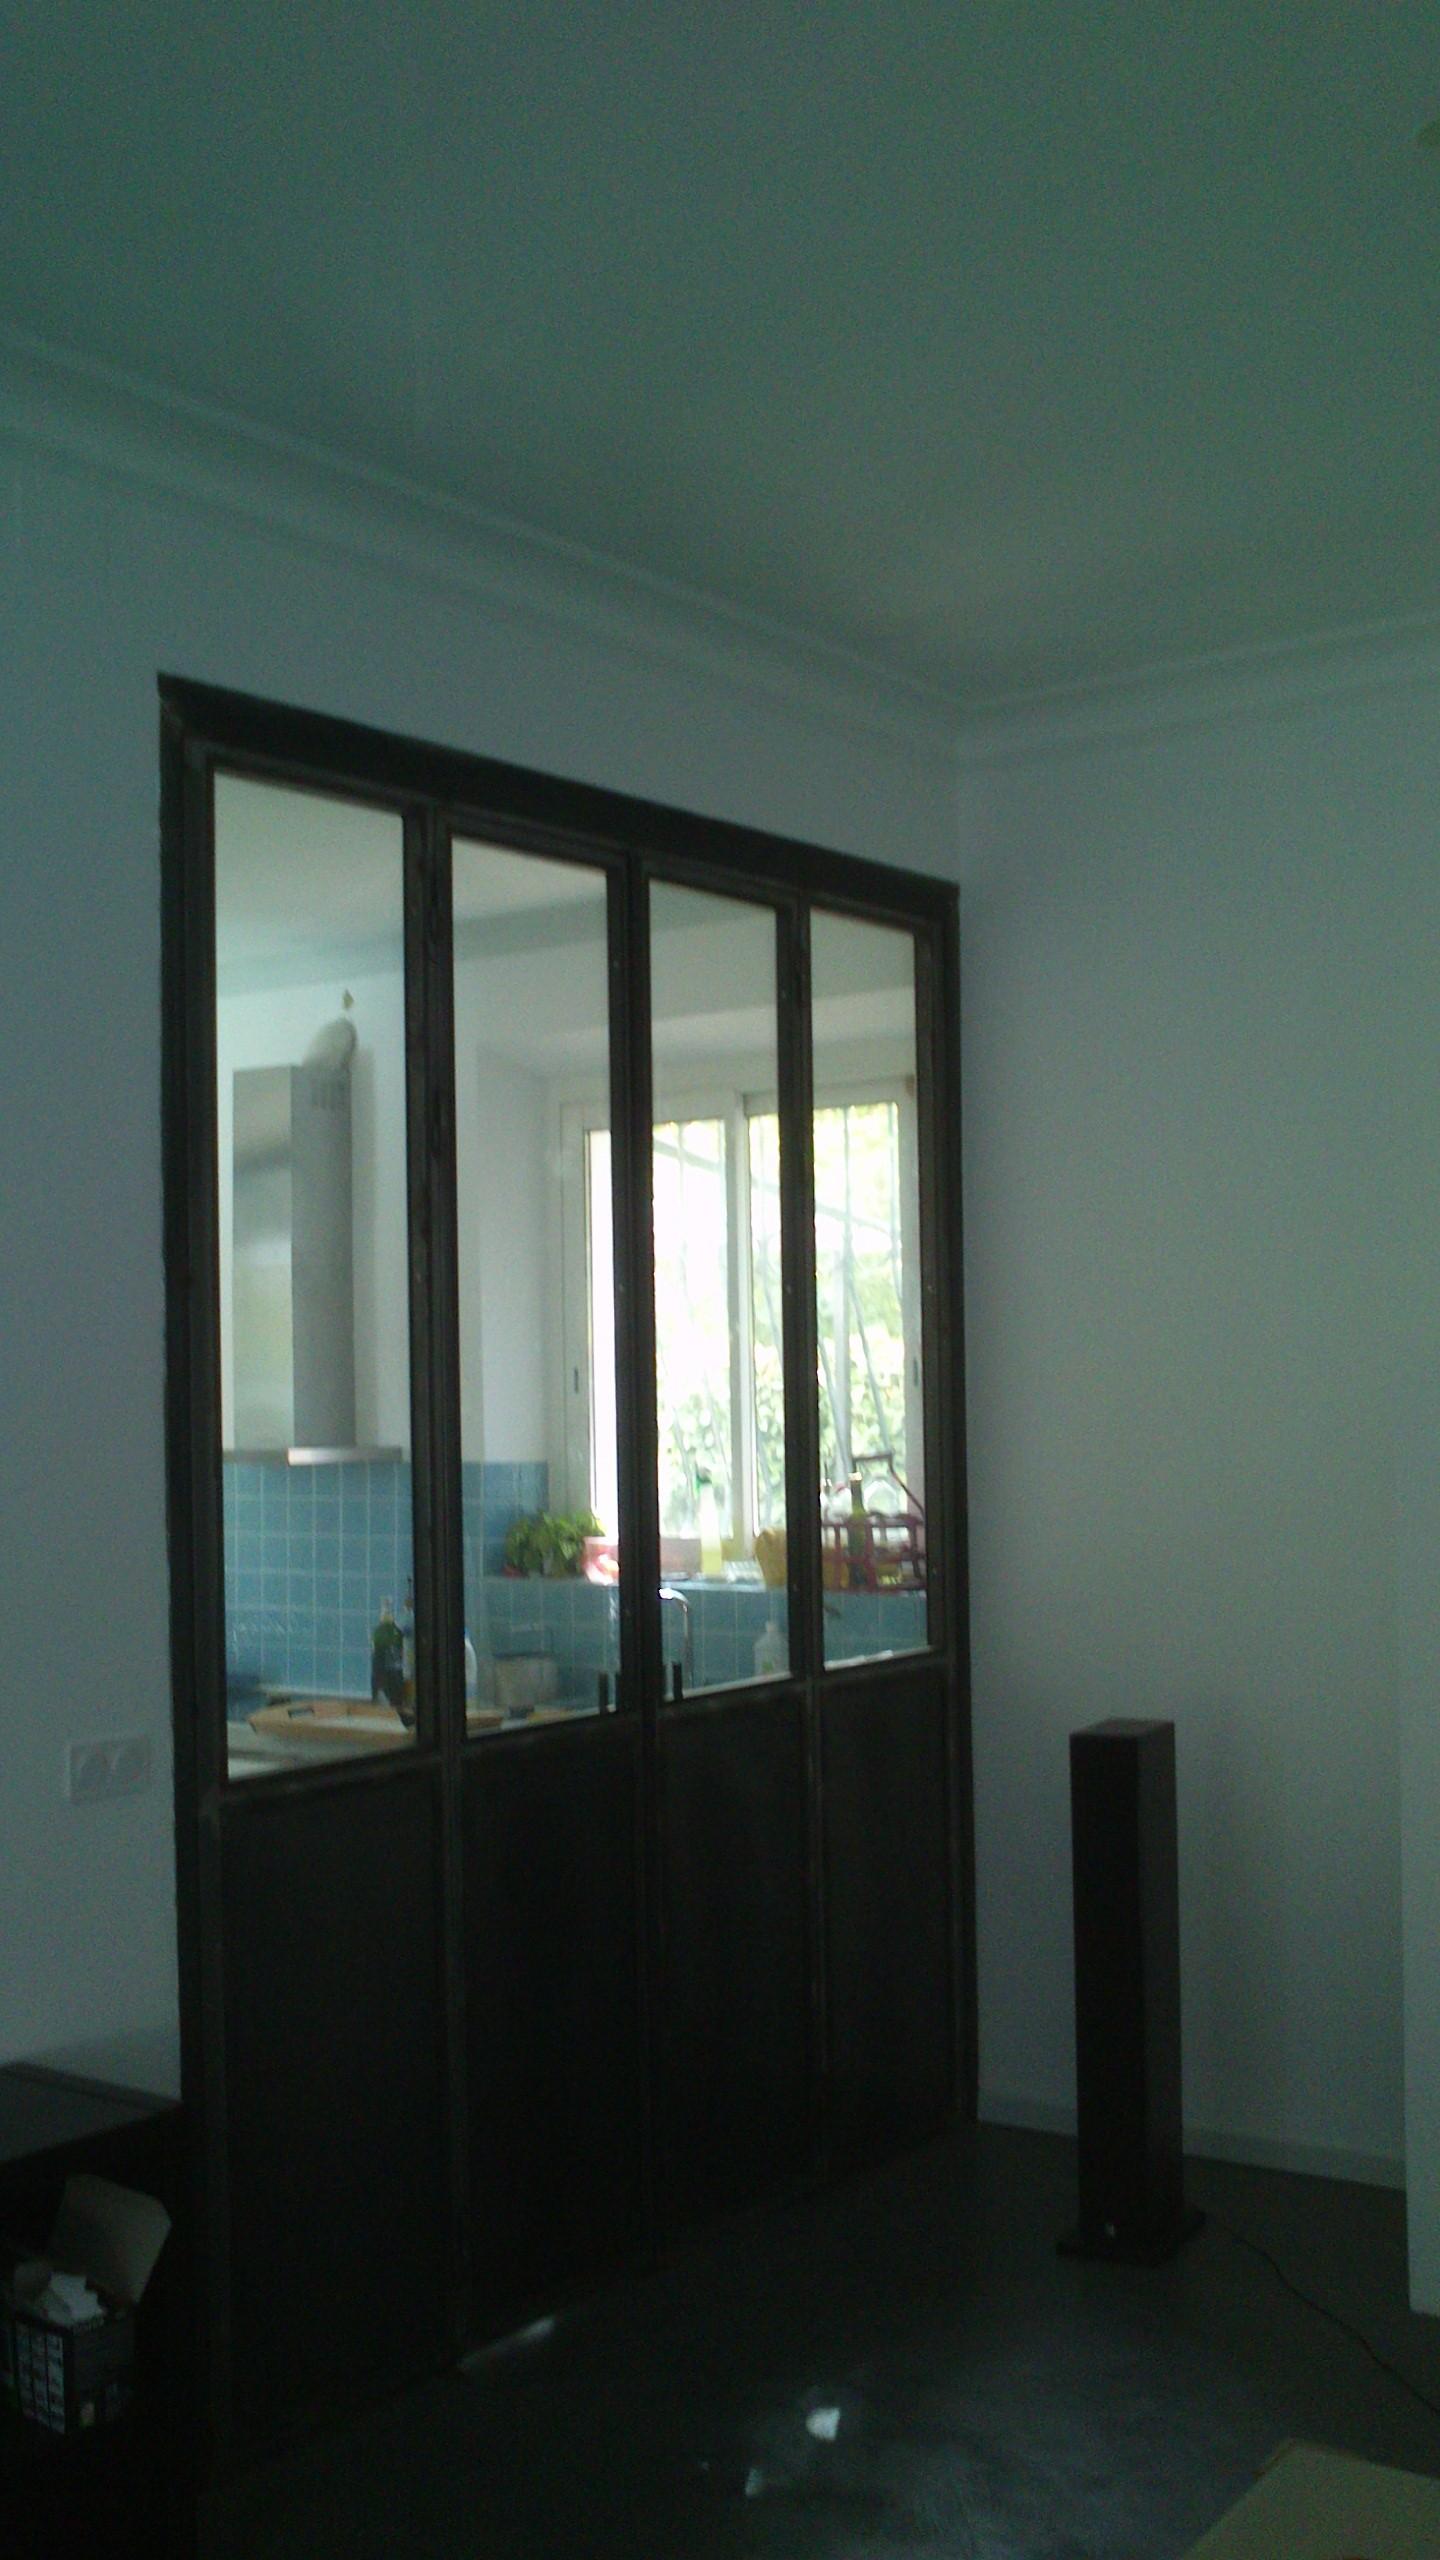 https://www.mon-artisan-ferronnier.com/wp-content/uploads/2021/05/veranda8.jpeg